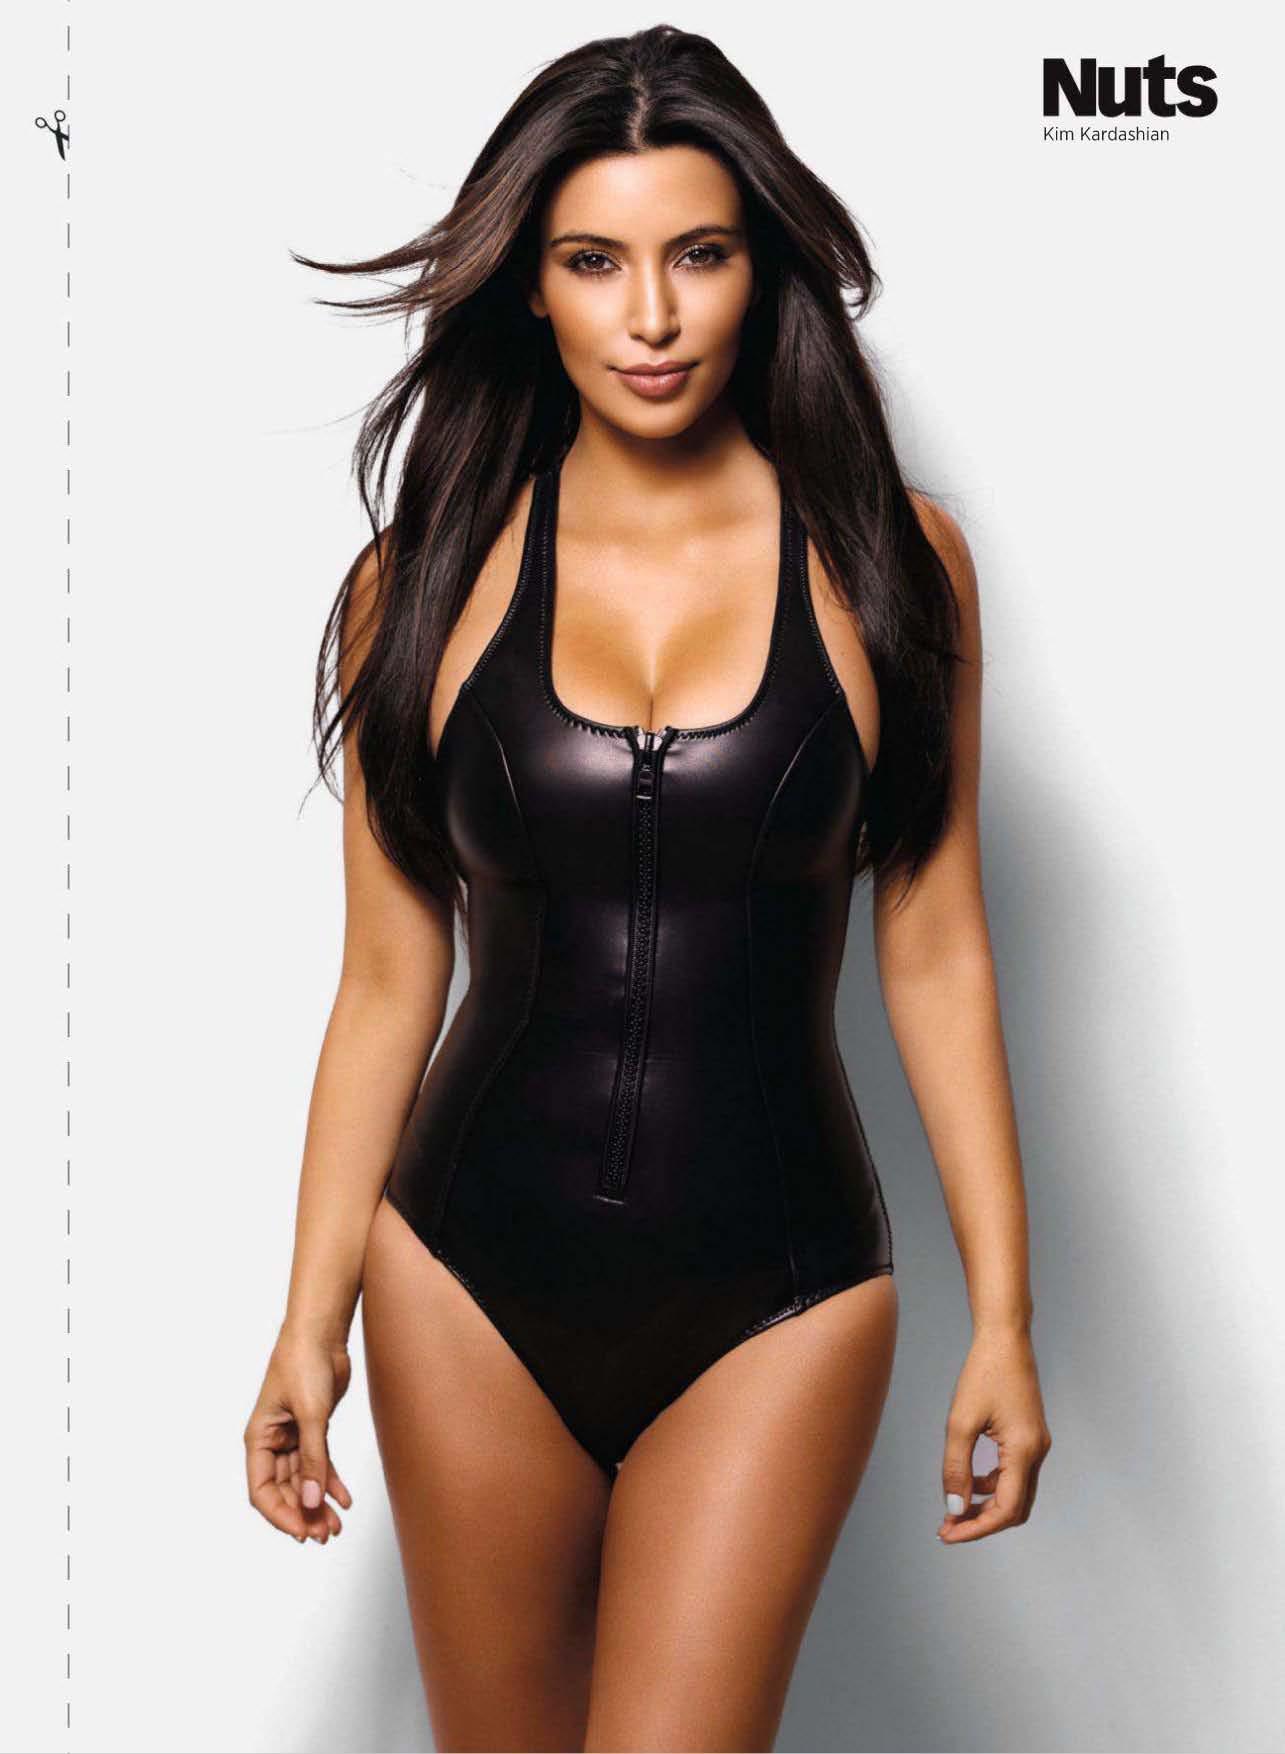 Angelina jolie bikini photos